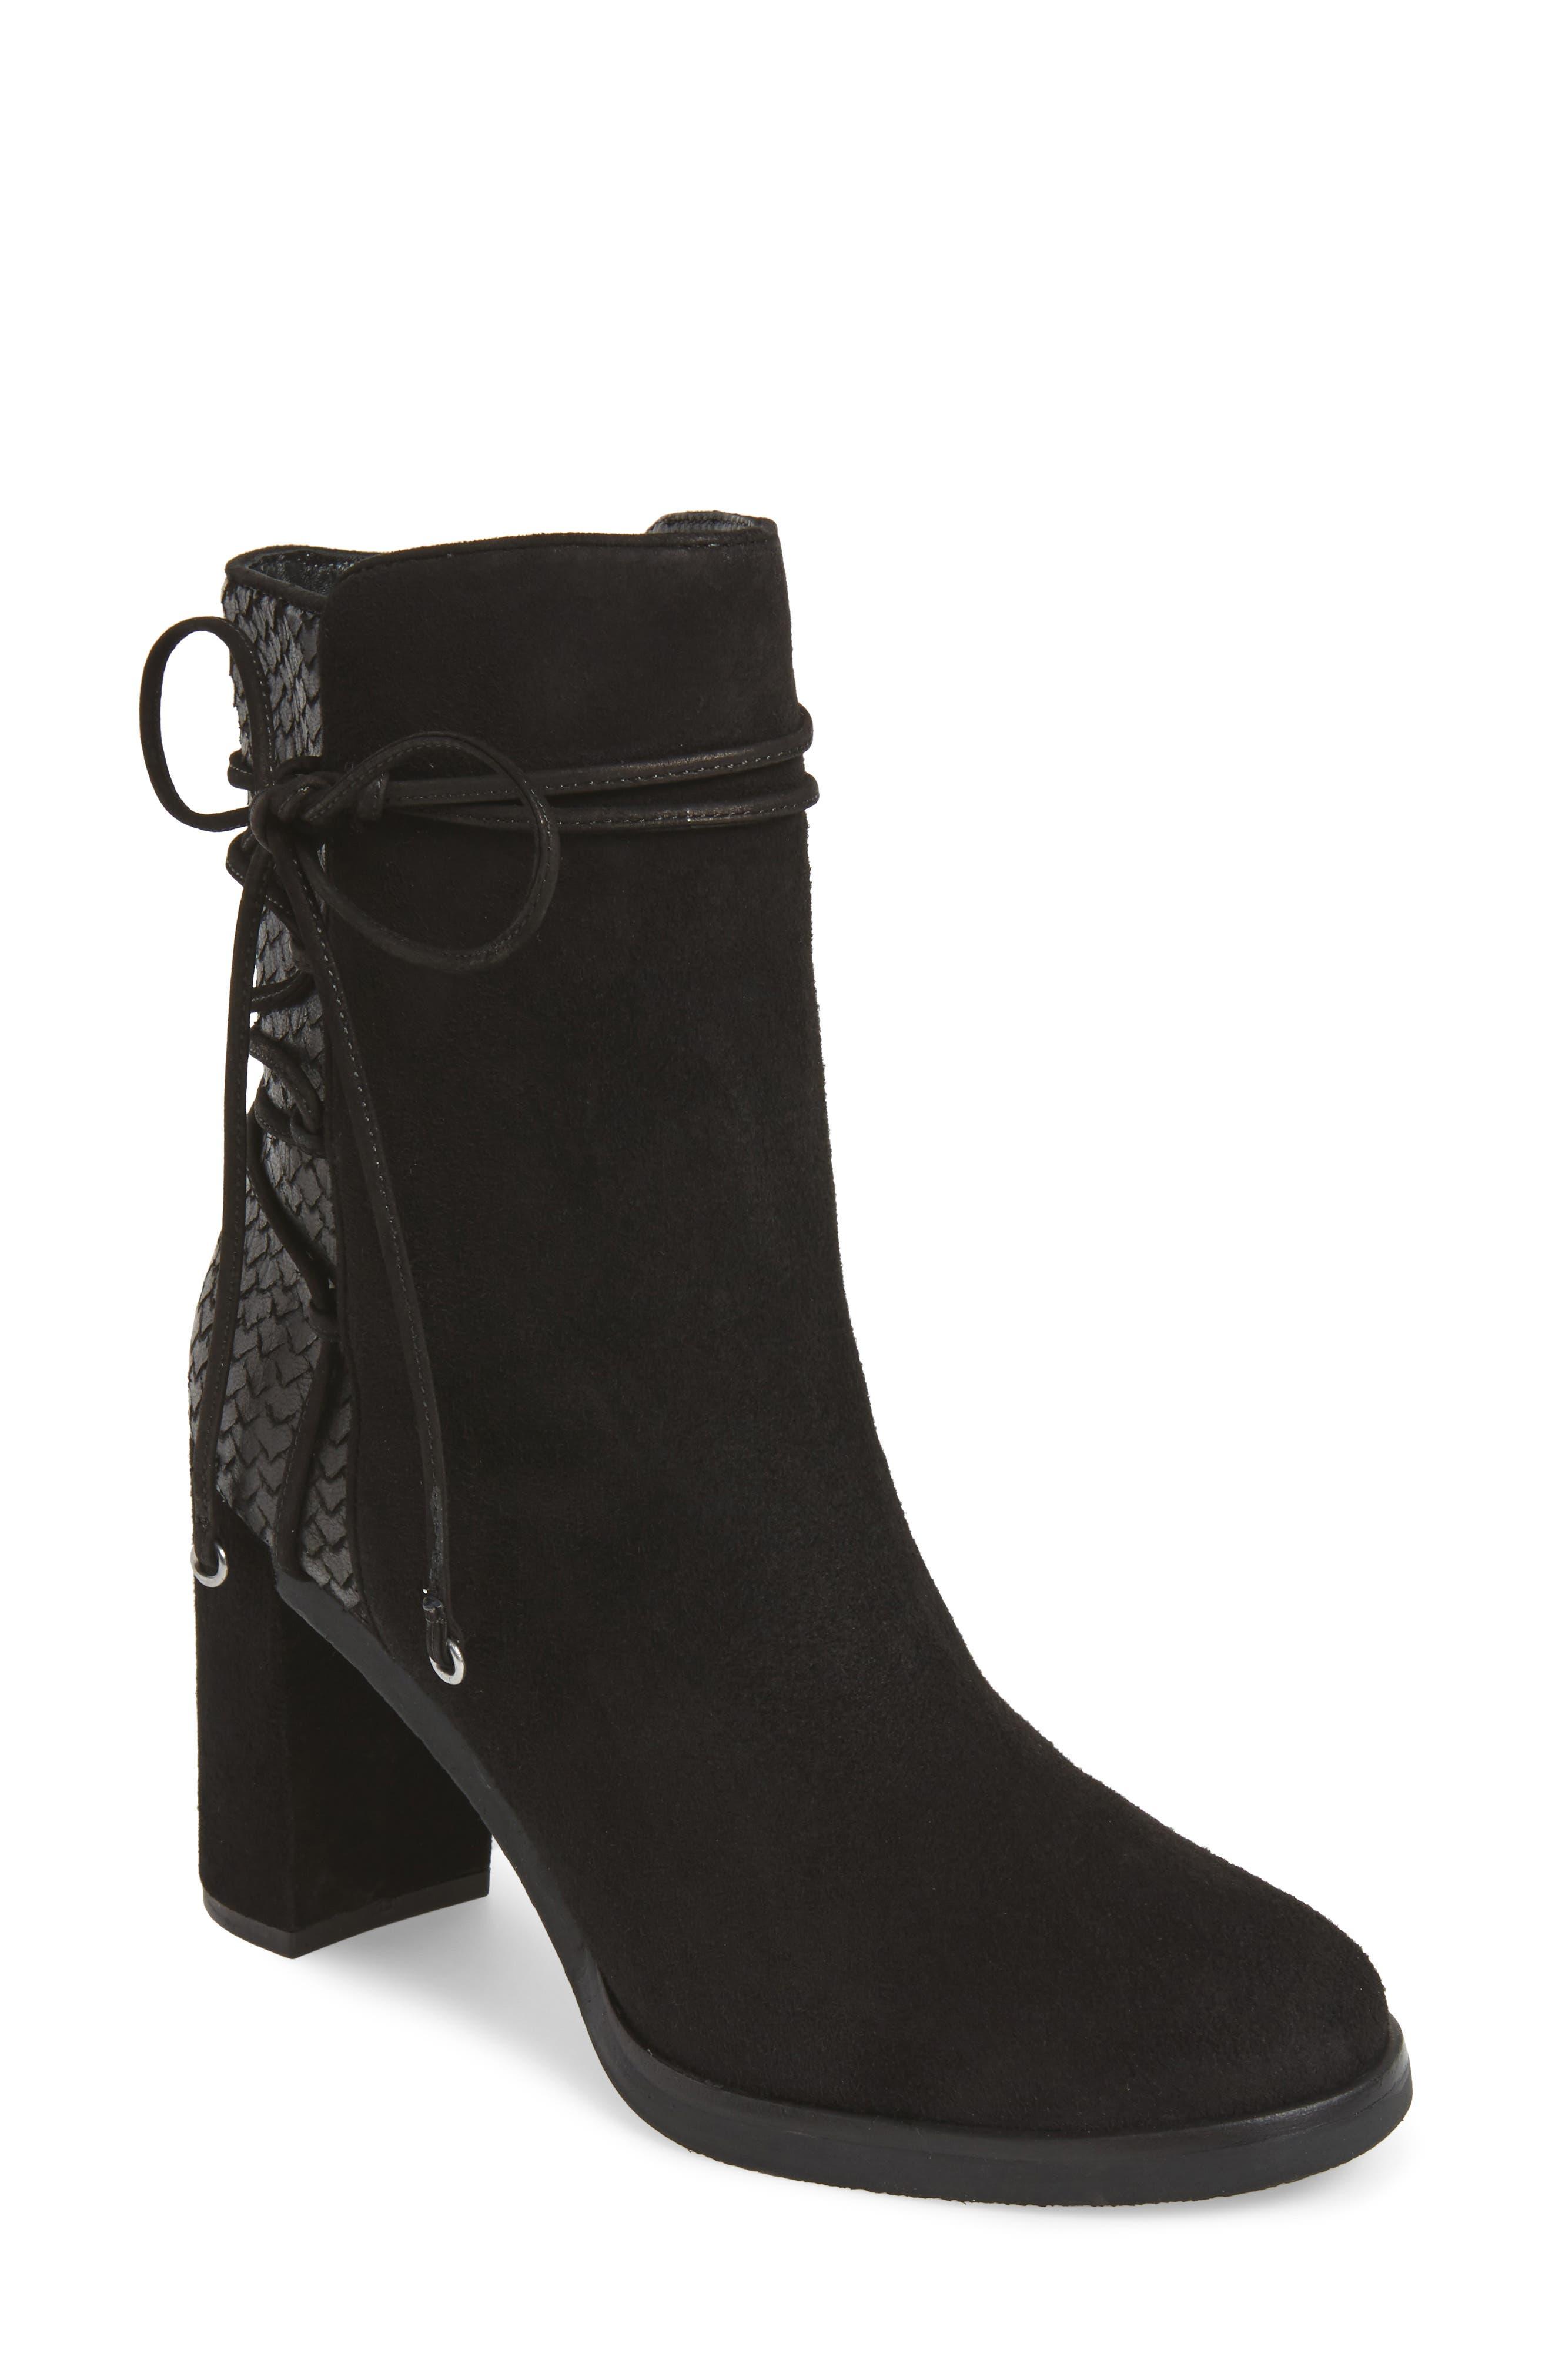 Adley Ankle Wrap Boot,                         Main,                         color, Black Suede